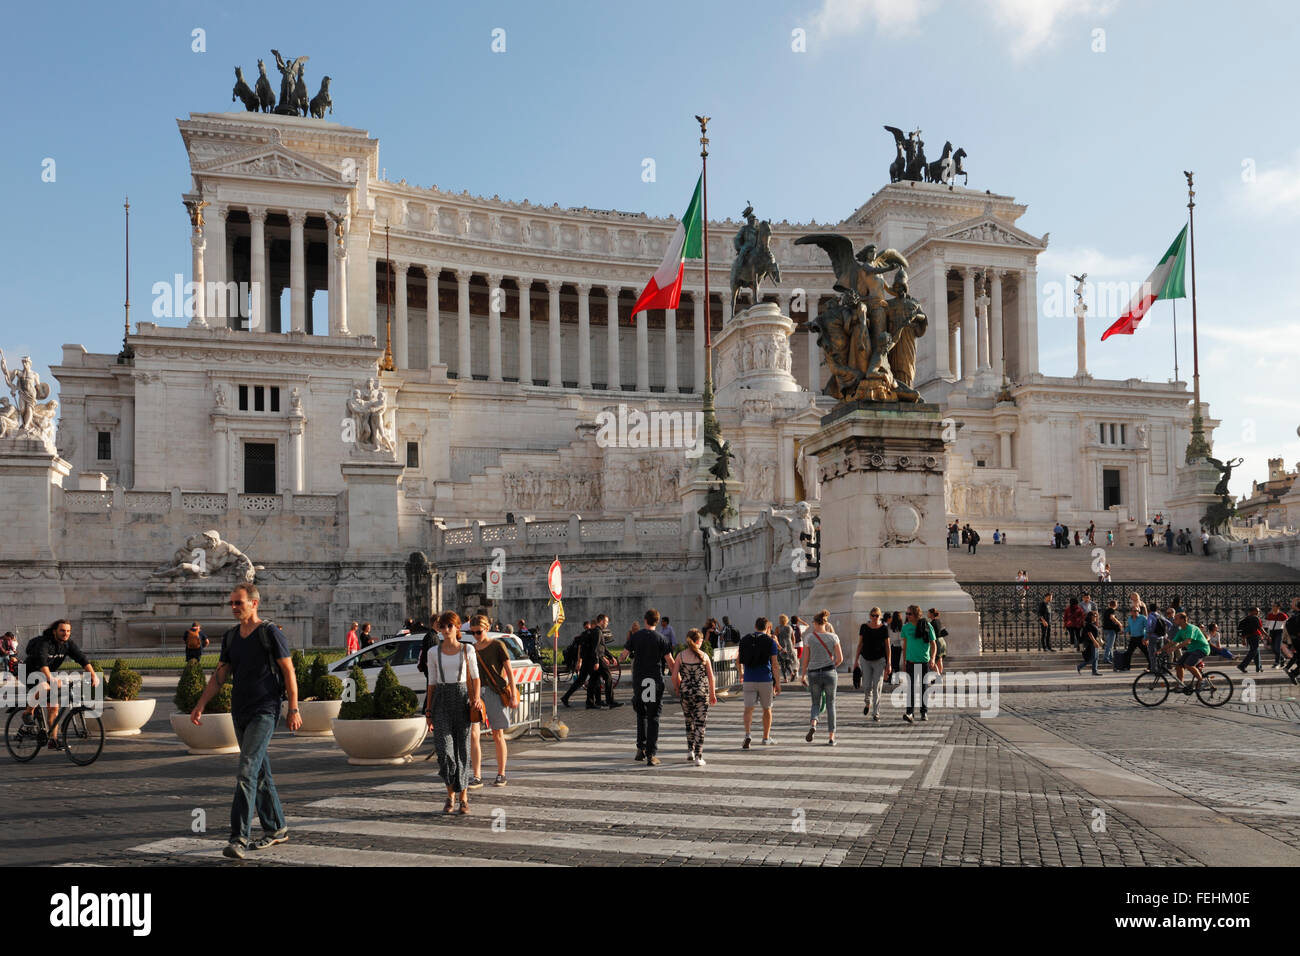 The National Monument of Vittorio Emanuele II in Rome, Italy; Altare della Patria, Altar of the Fatherland - Stock Image